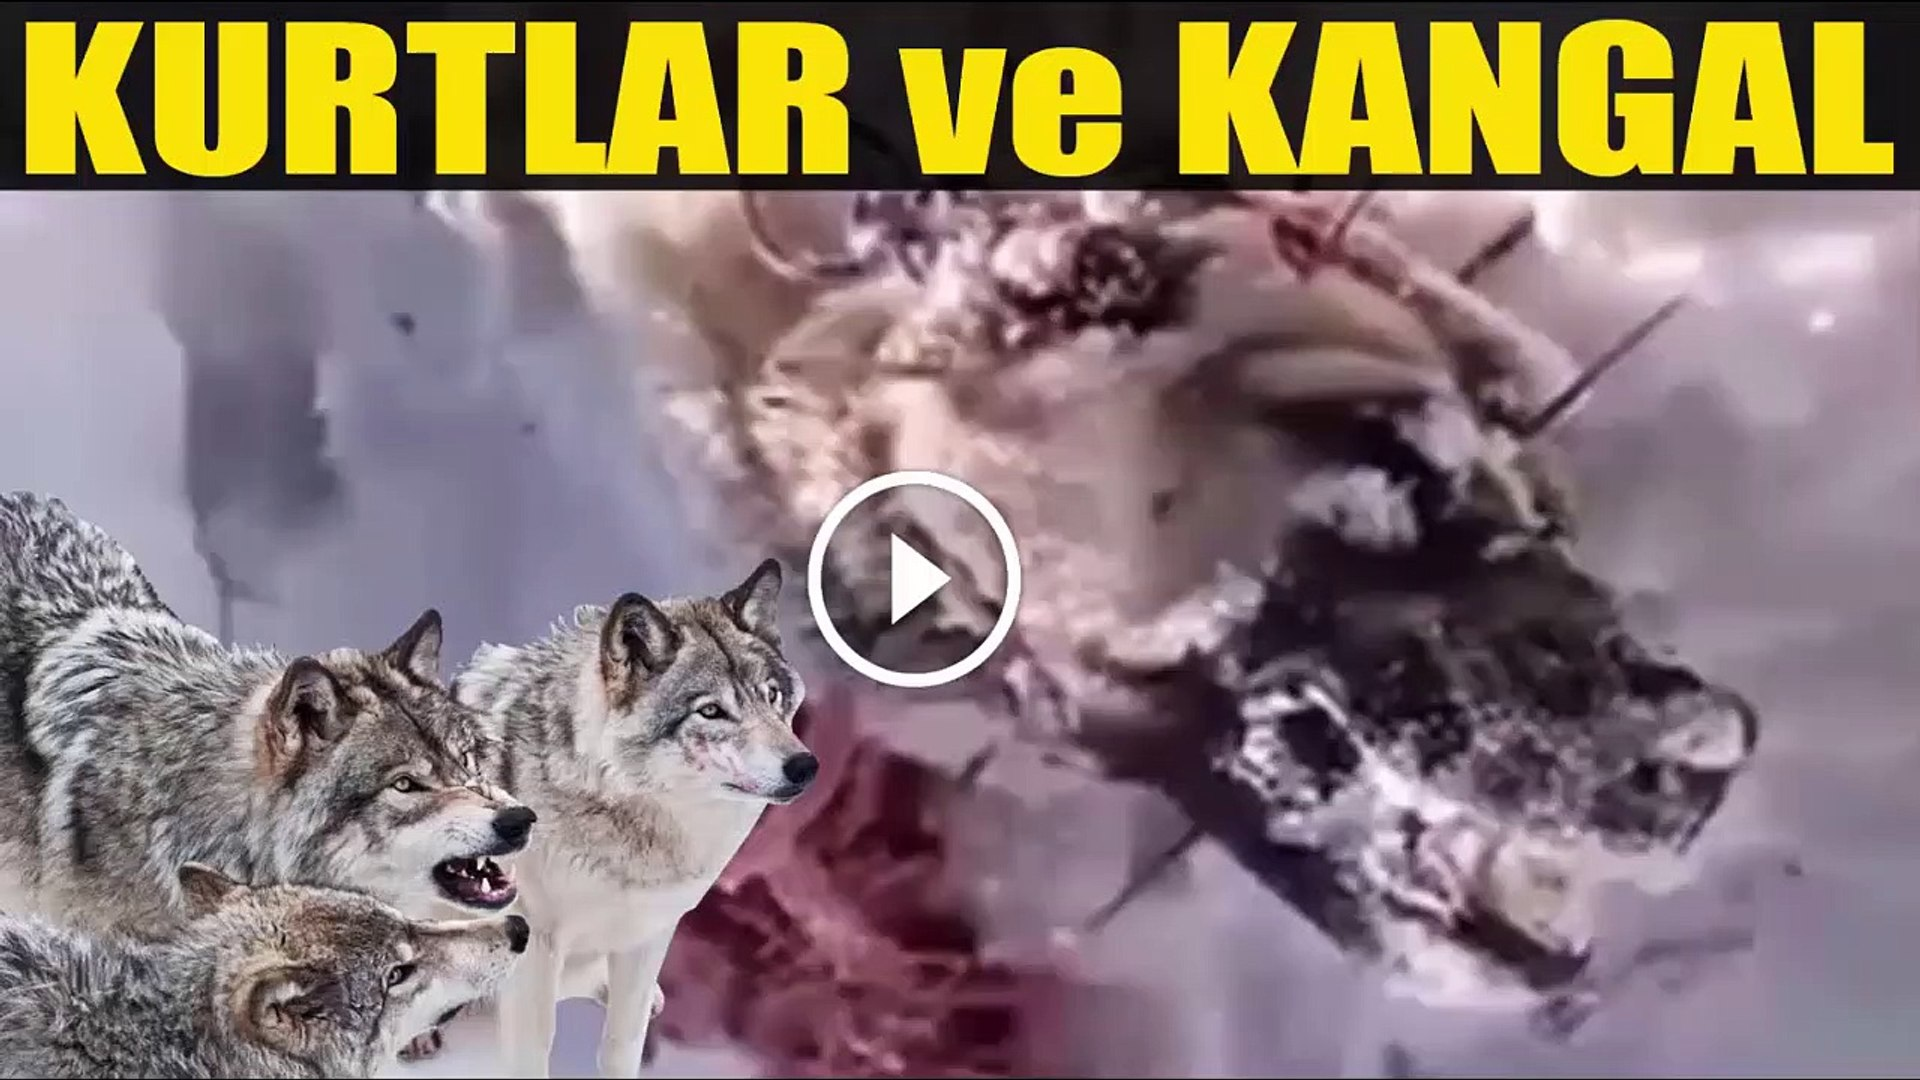 KURTLARIN VE SİVAS KANGALIN KARSILASMASI - WoLViES vs SiVAS KANGAL